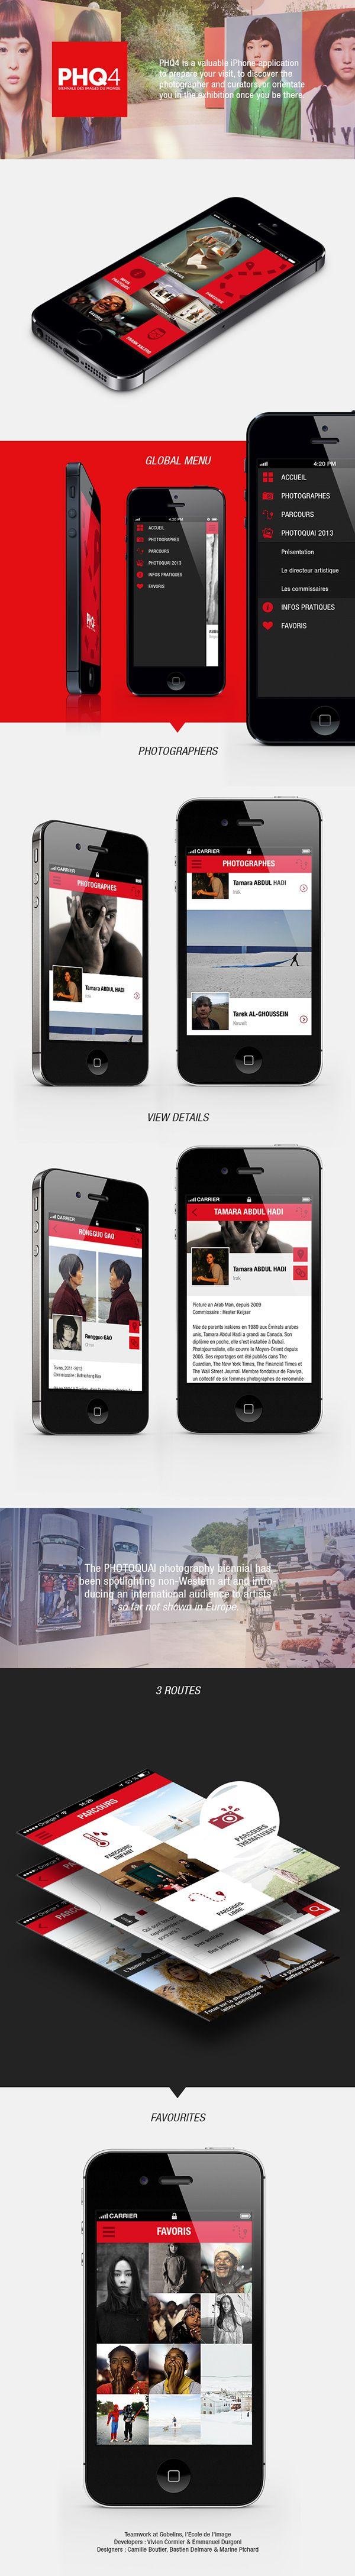 iPhone app : PHQ4 on Behance